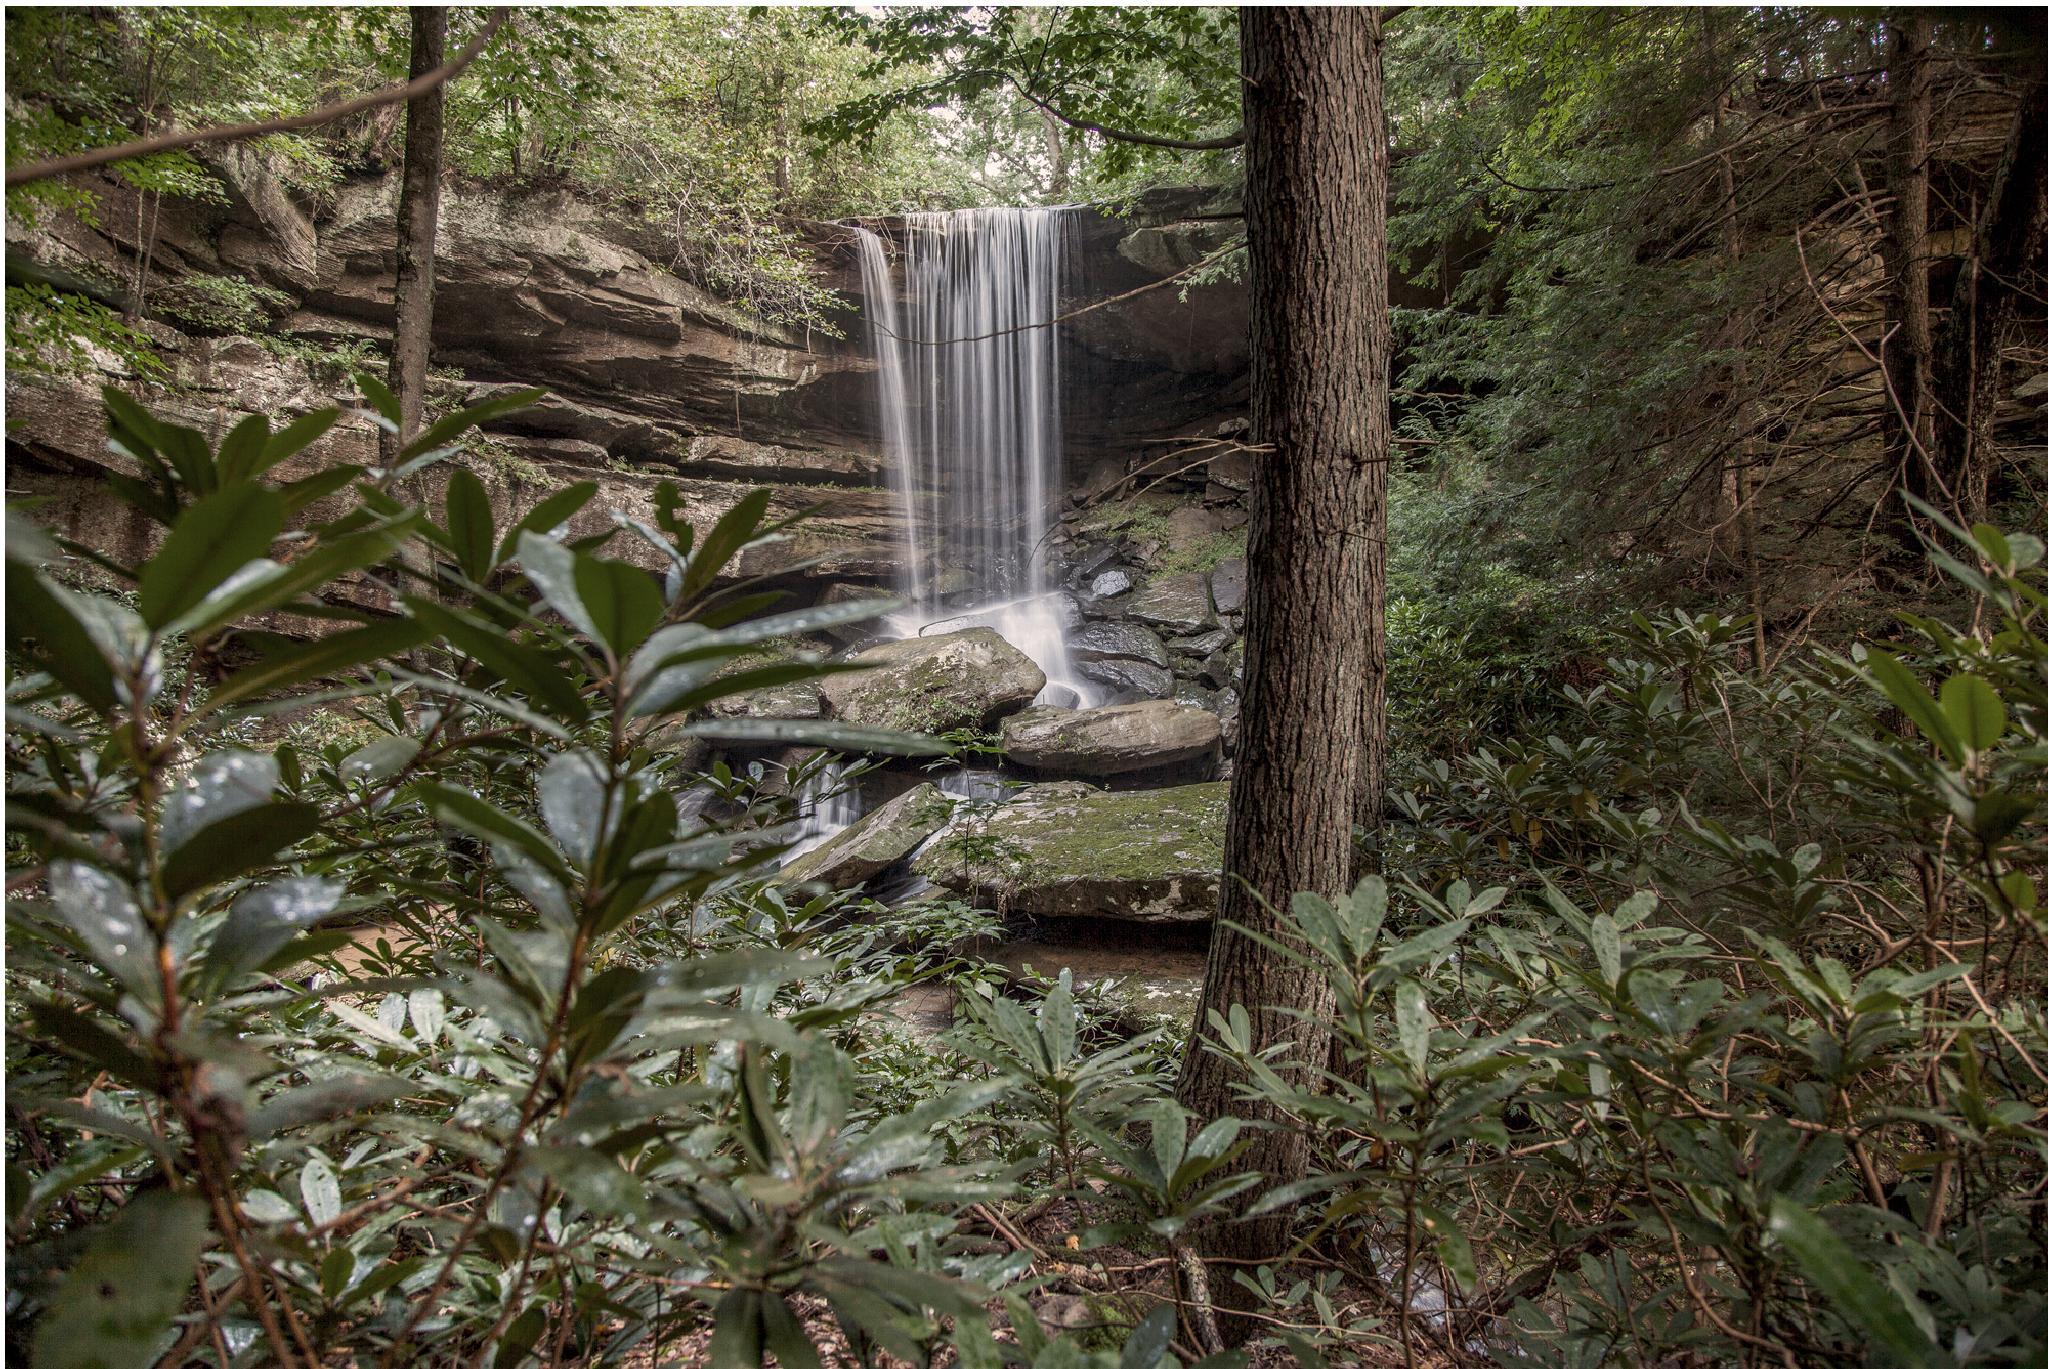 WaterFall on Coon Creek Kentucky  by Diana Clark